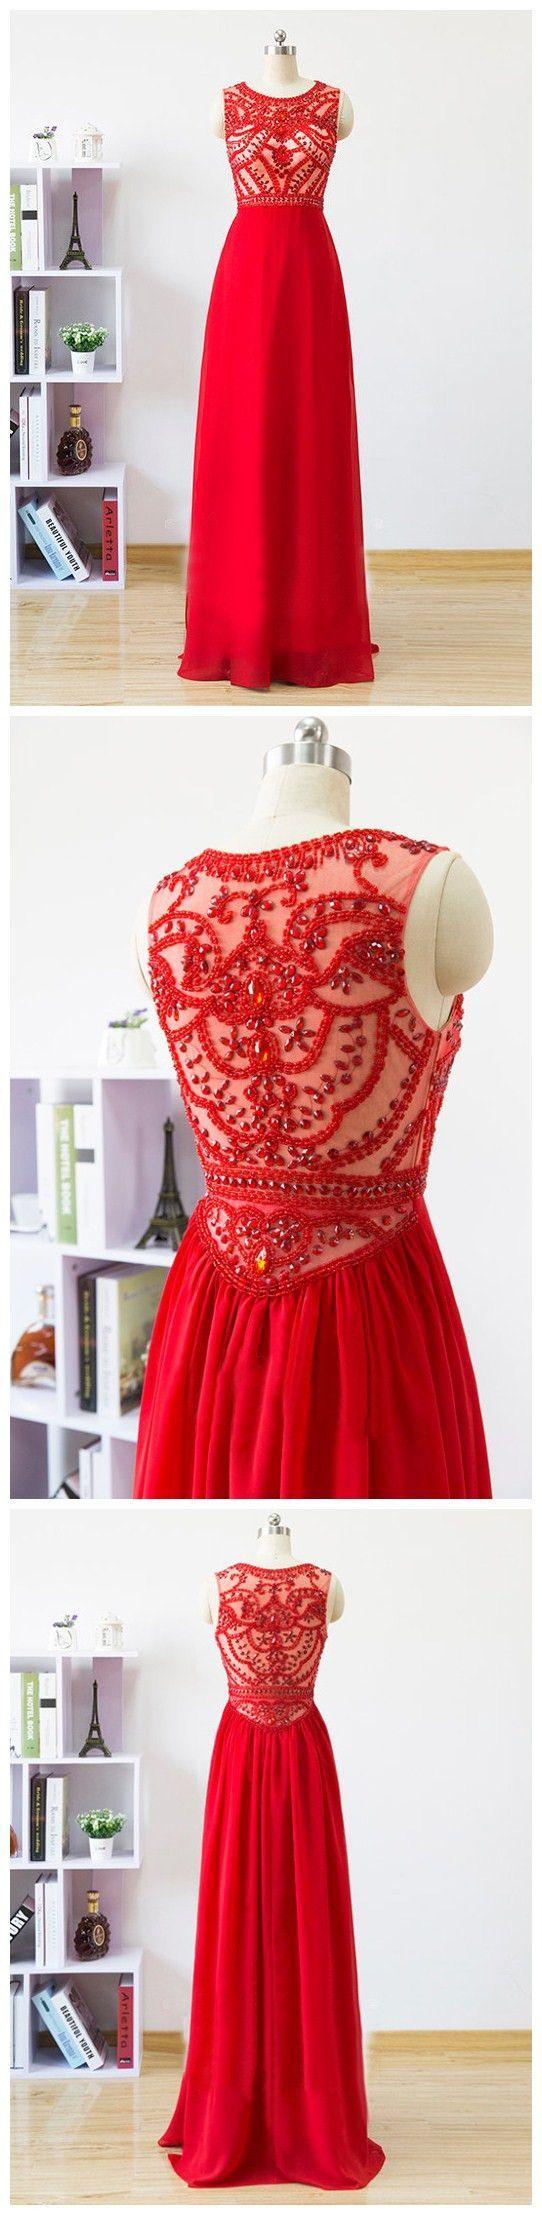 Red long prom dressesprom dressevening dress evening dressesprom